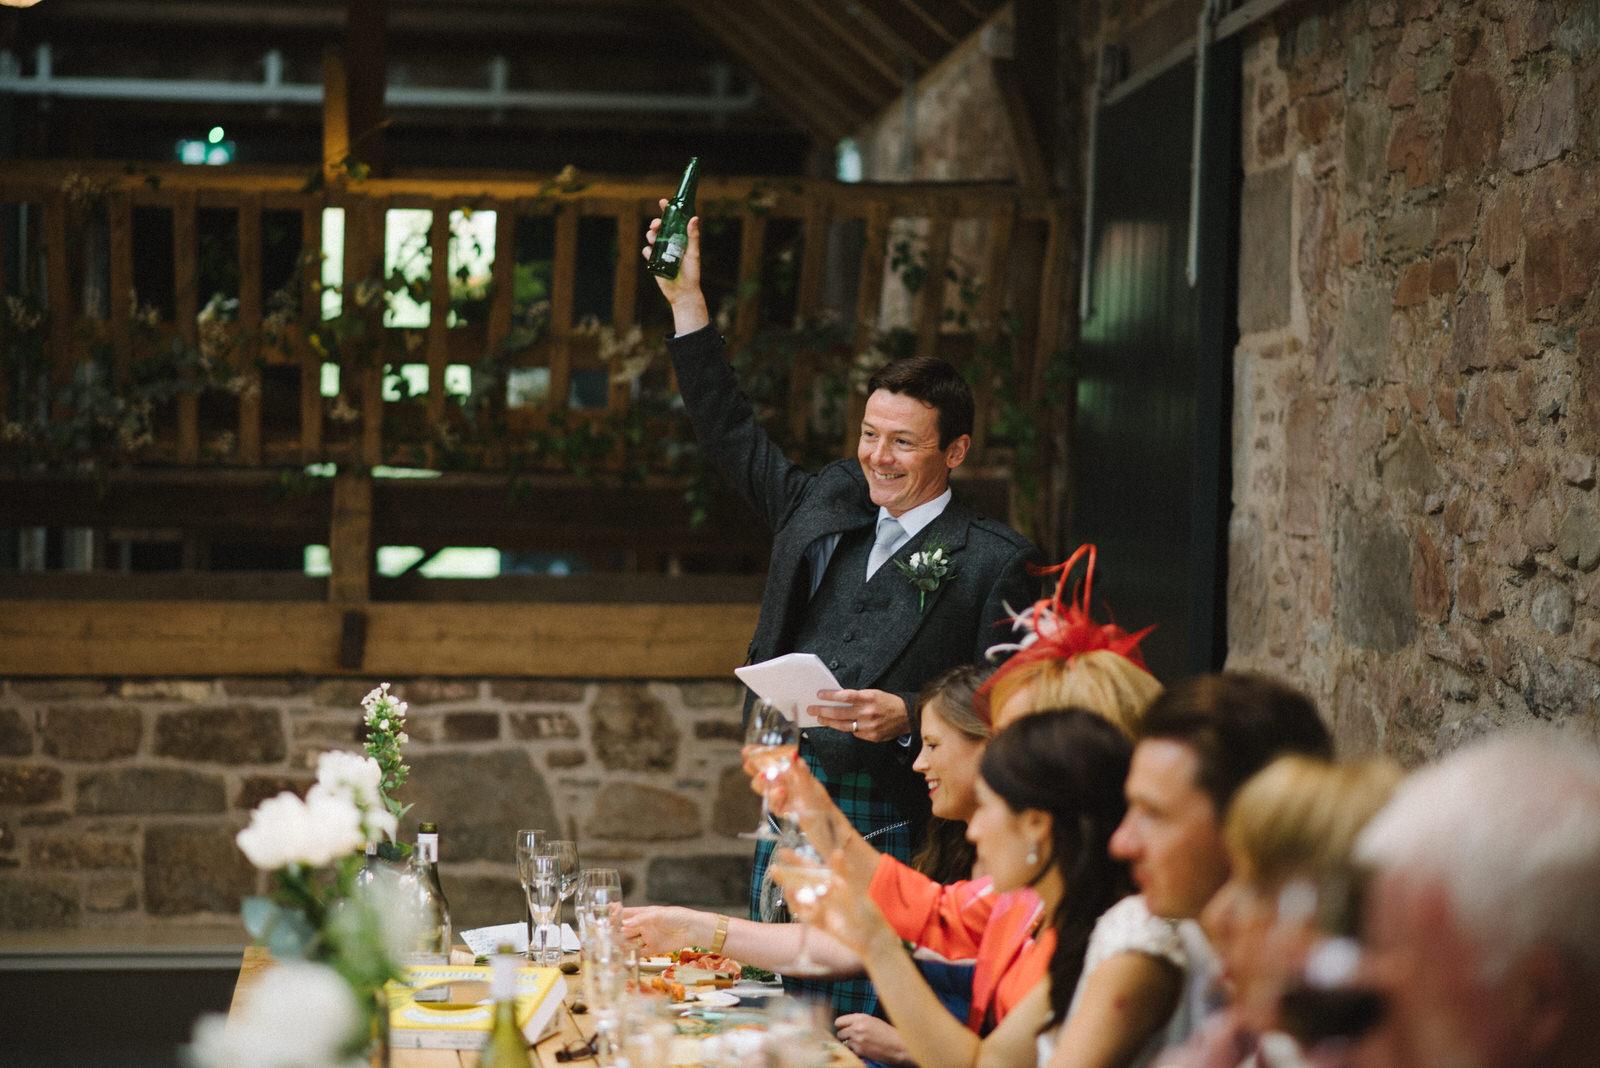 049-GUARDSWELL-FARM-WEDDING-ALTERNATIVE-SCOTTISH-WEDDING-PHOTOGRAPHER-SCOTTISH-WEDDING-DESTINATION-WEDDING-PHOTOGRAPHER.JPG